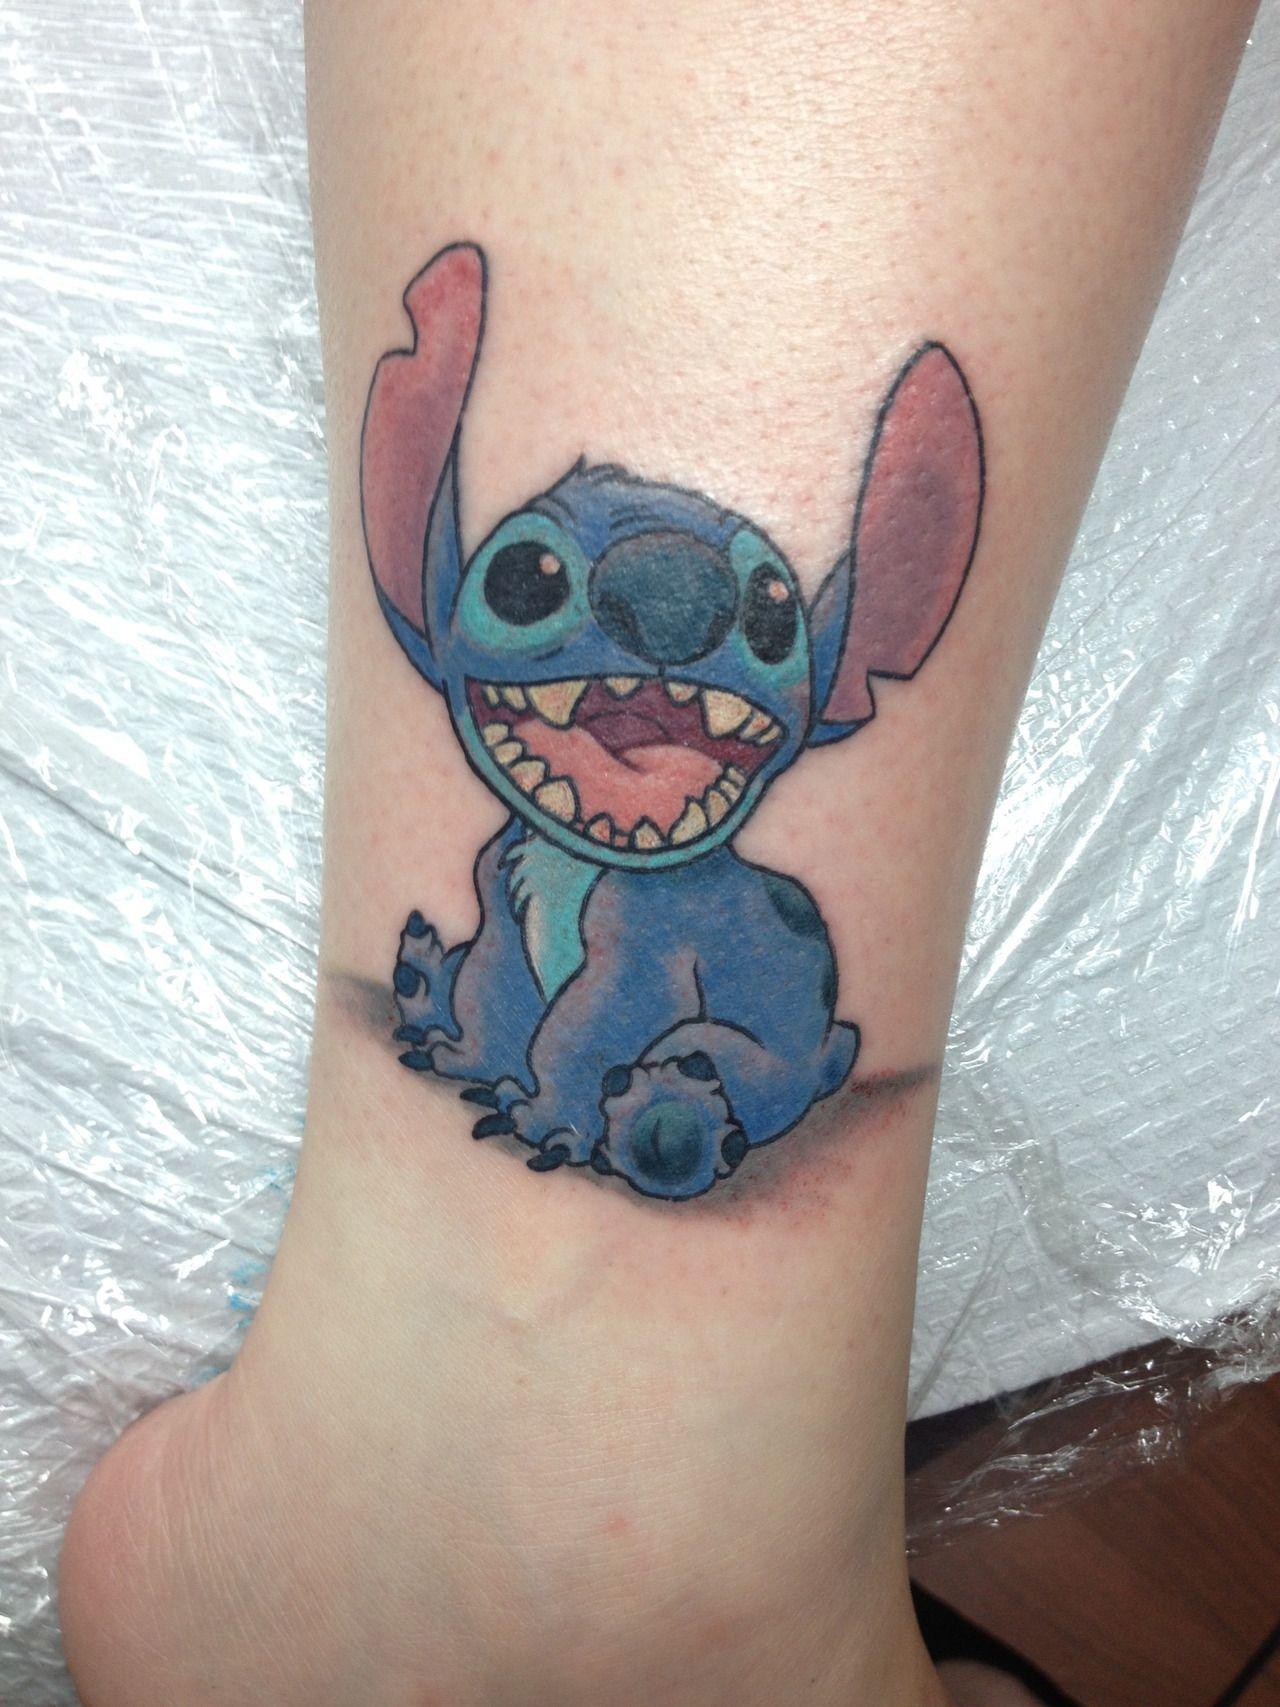 Stitching Tattoo: My Disney Tattoo! Stitch! Done By Tori At Studio 69 In